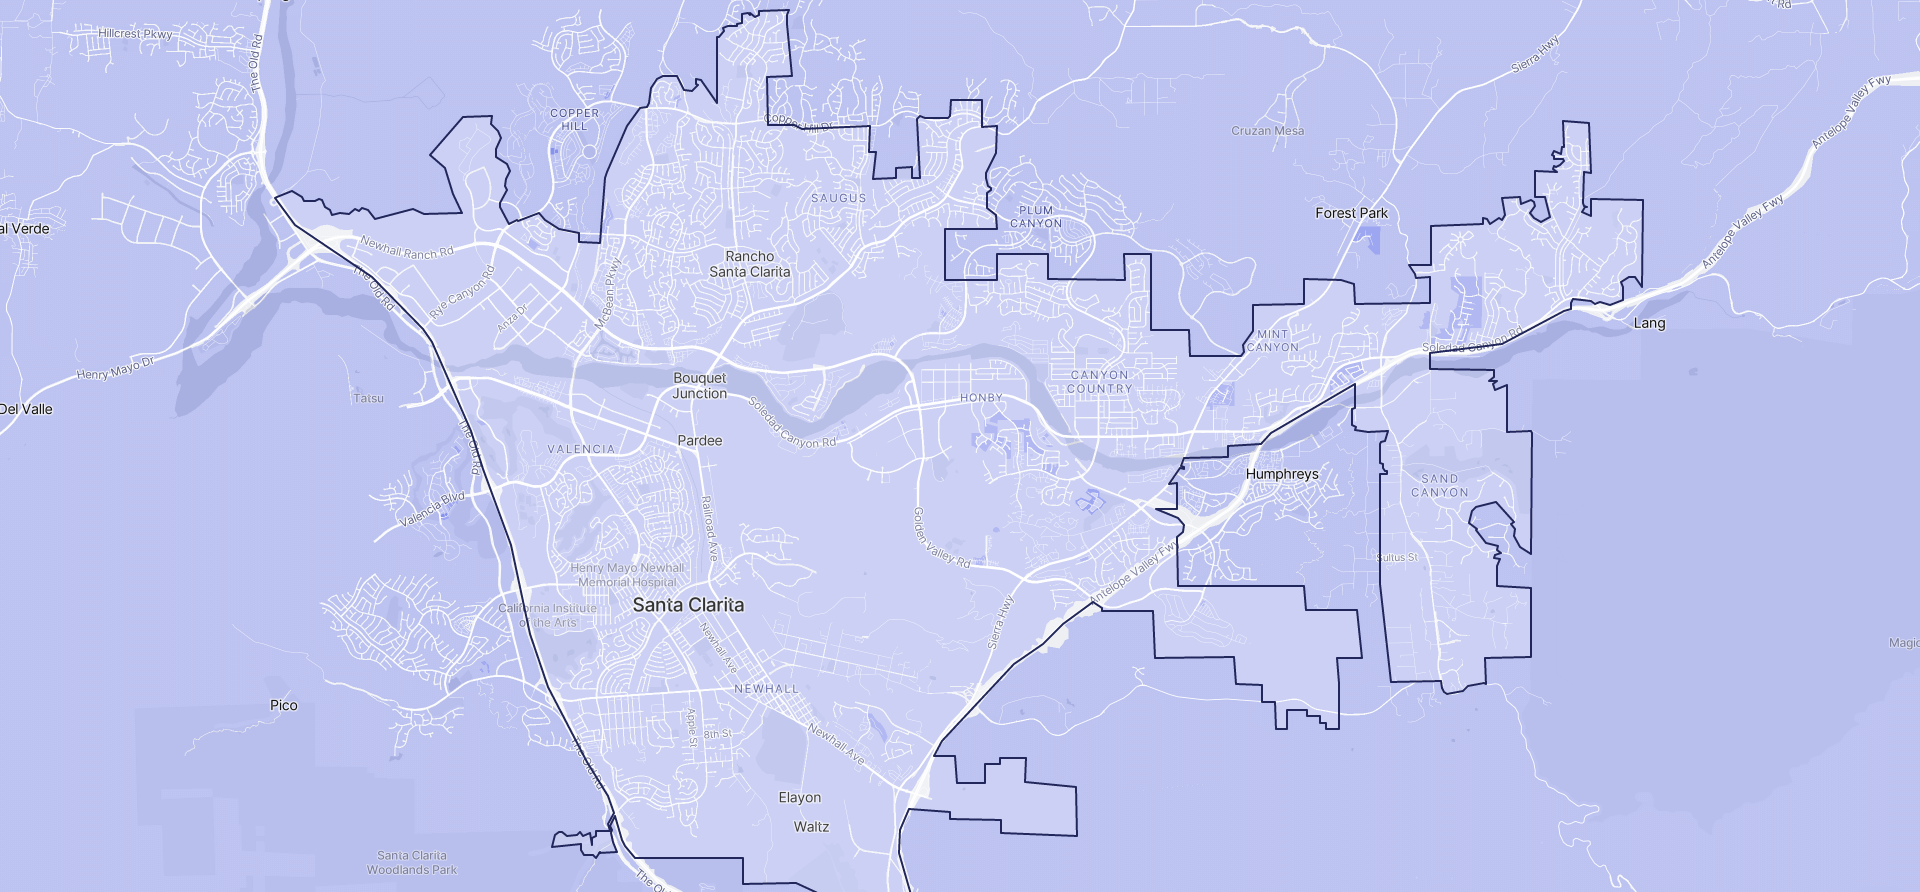 Image of Santa Clarita boundaries on a map.